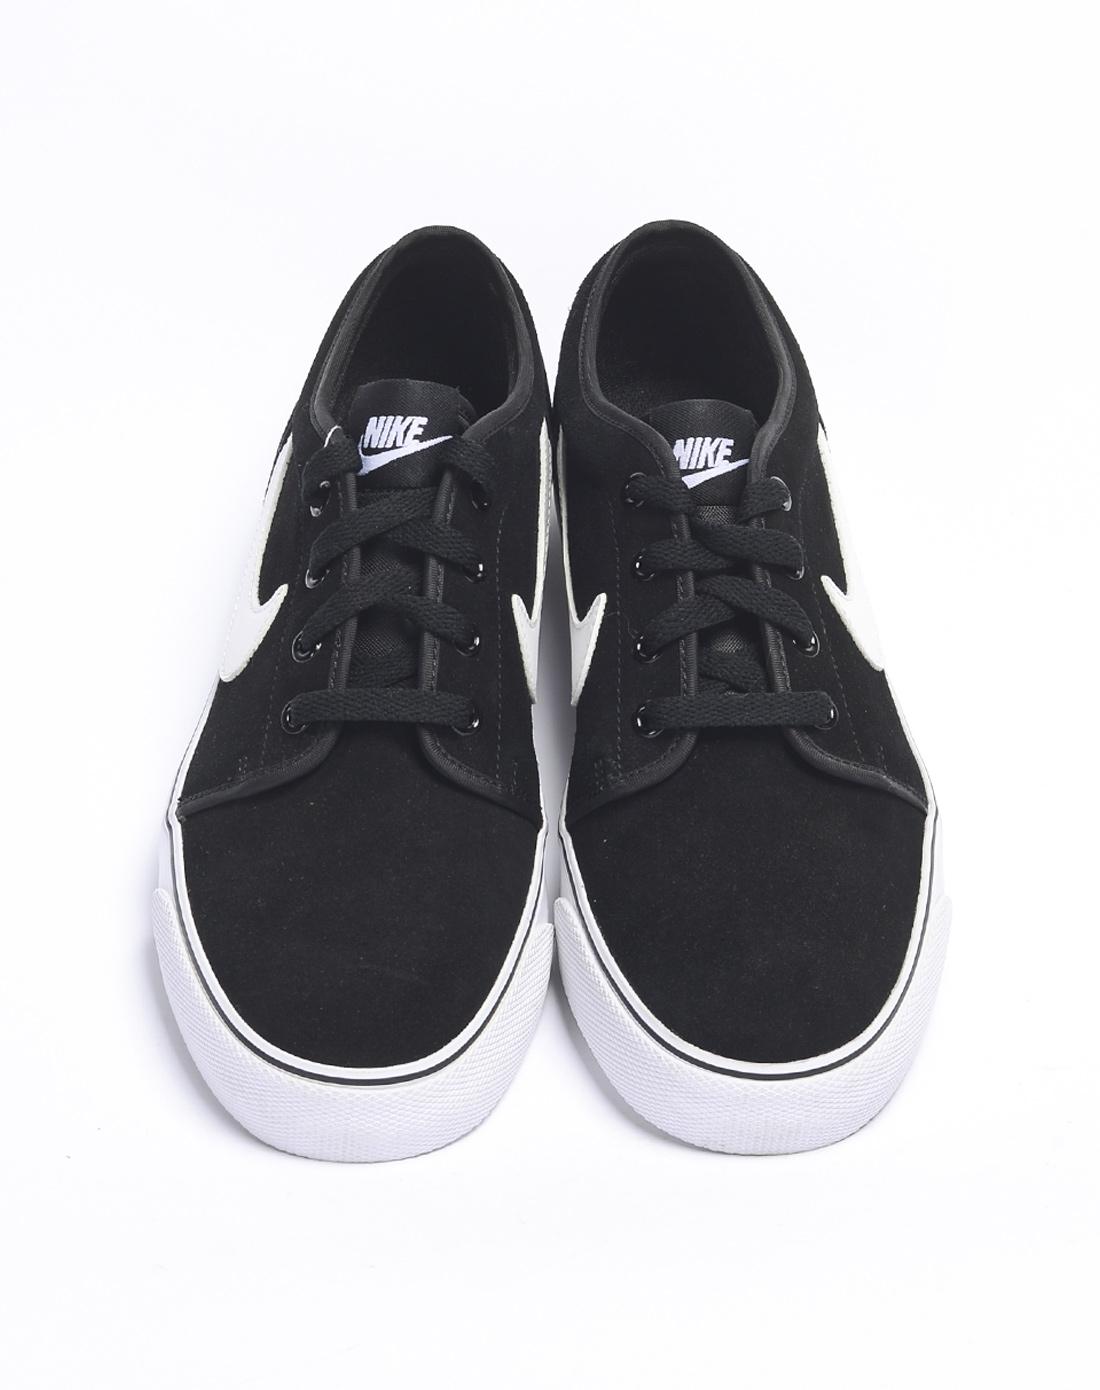 ike男子黑色复古鞋555270 001